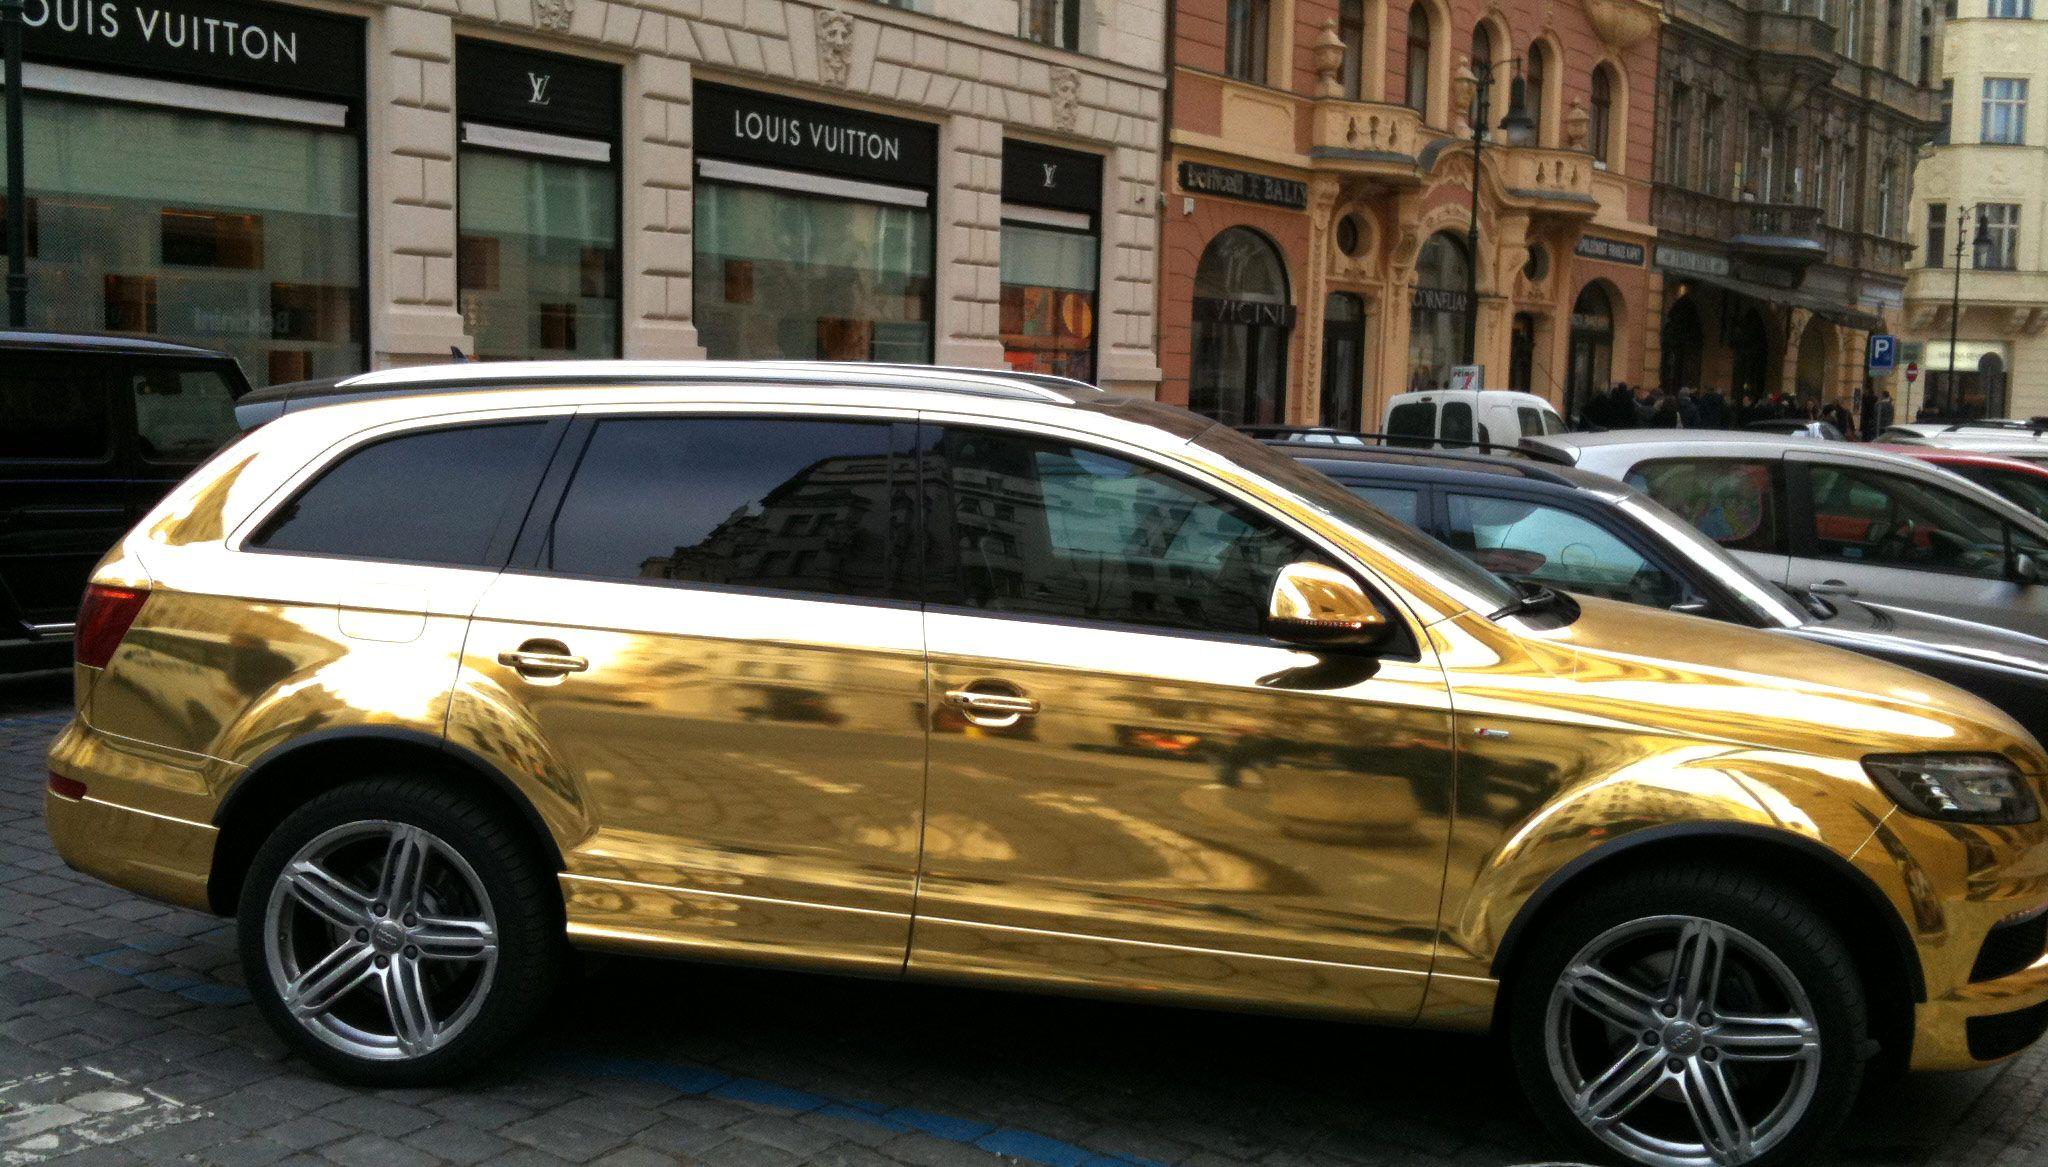 Audi q7 suv vossen wheels tuning cars wallpaper - Audi Q7 Gold Golden Audi Q7